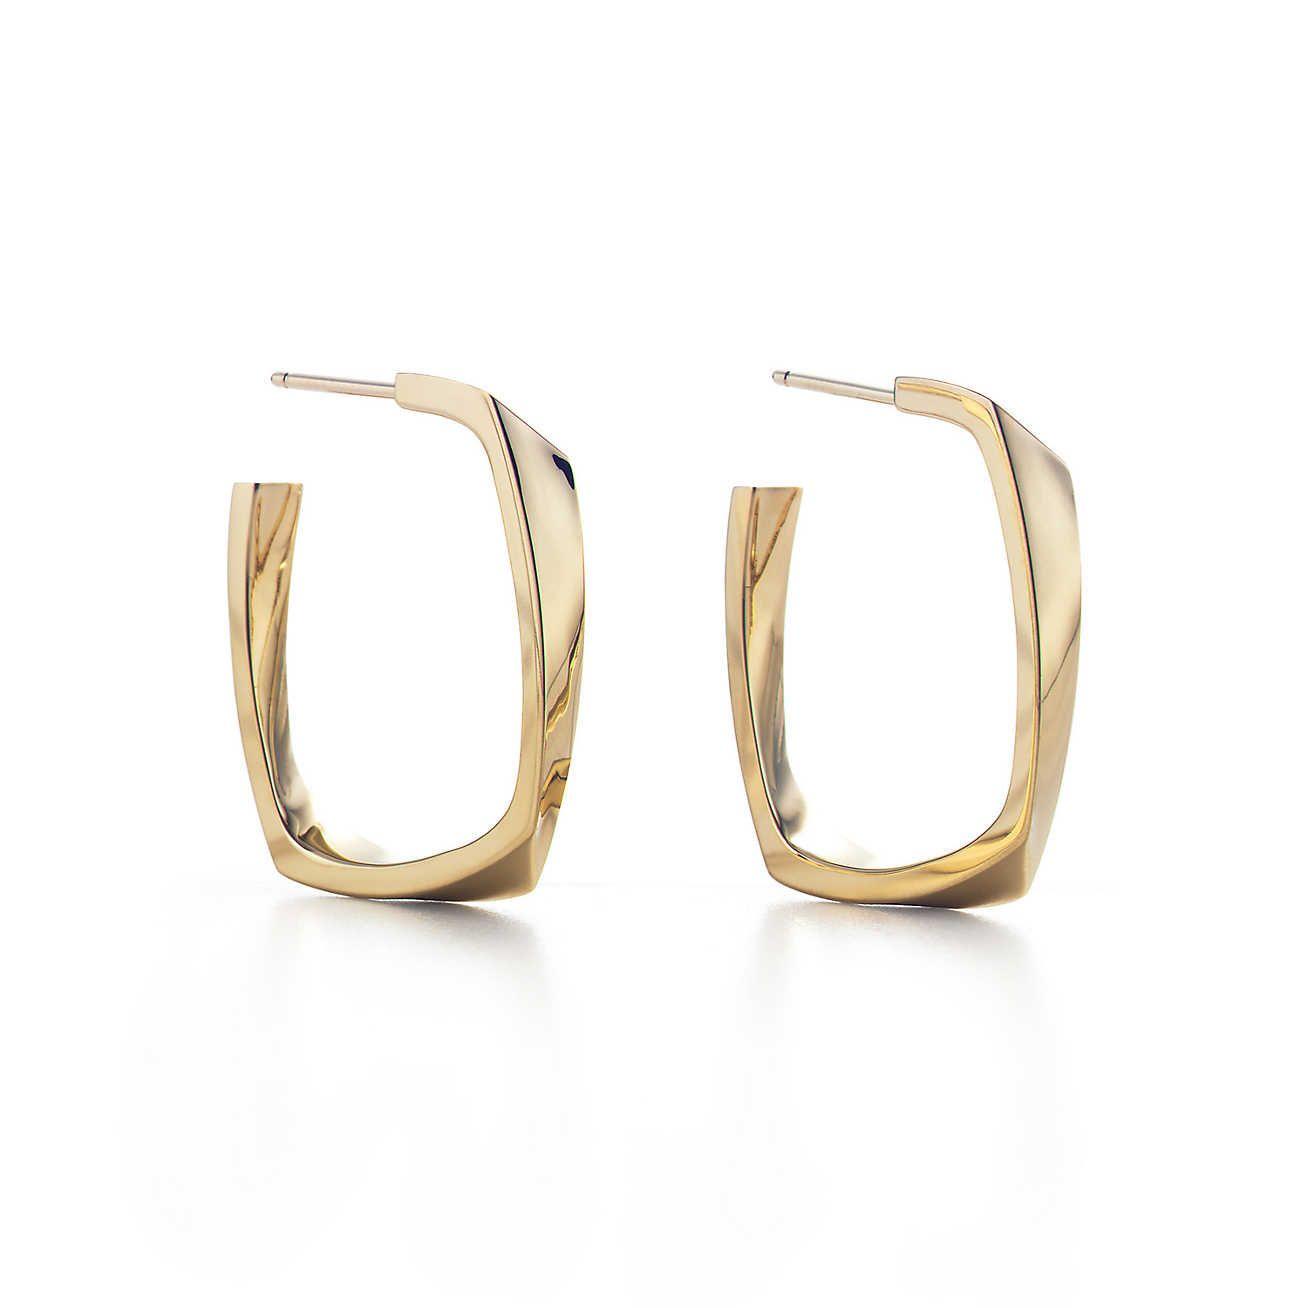 Frank Gehry® Torque hoop earrings in 18k gold, small. | Tiffany & Co